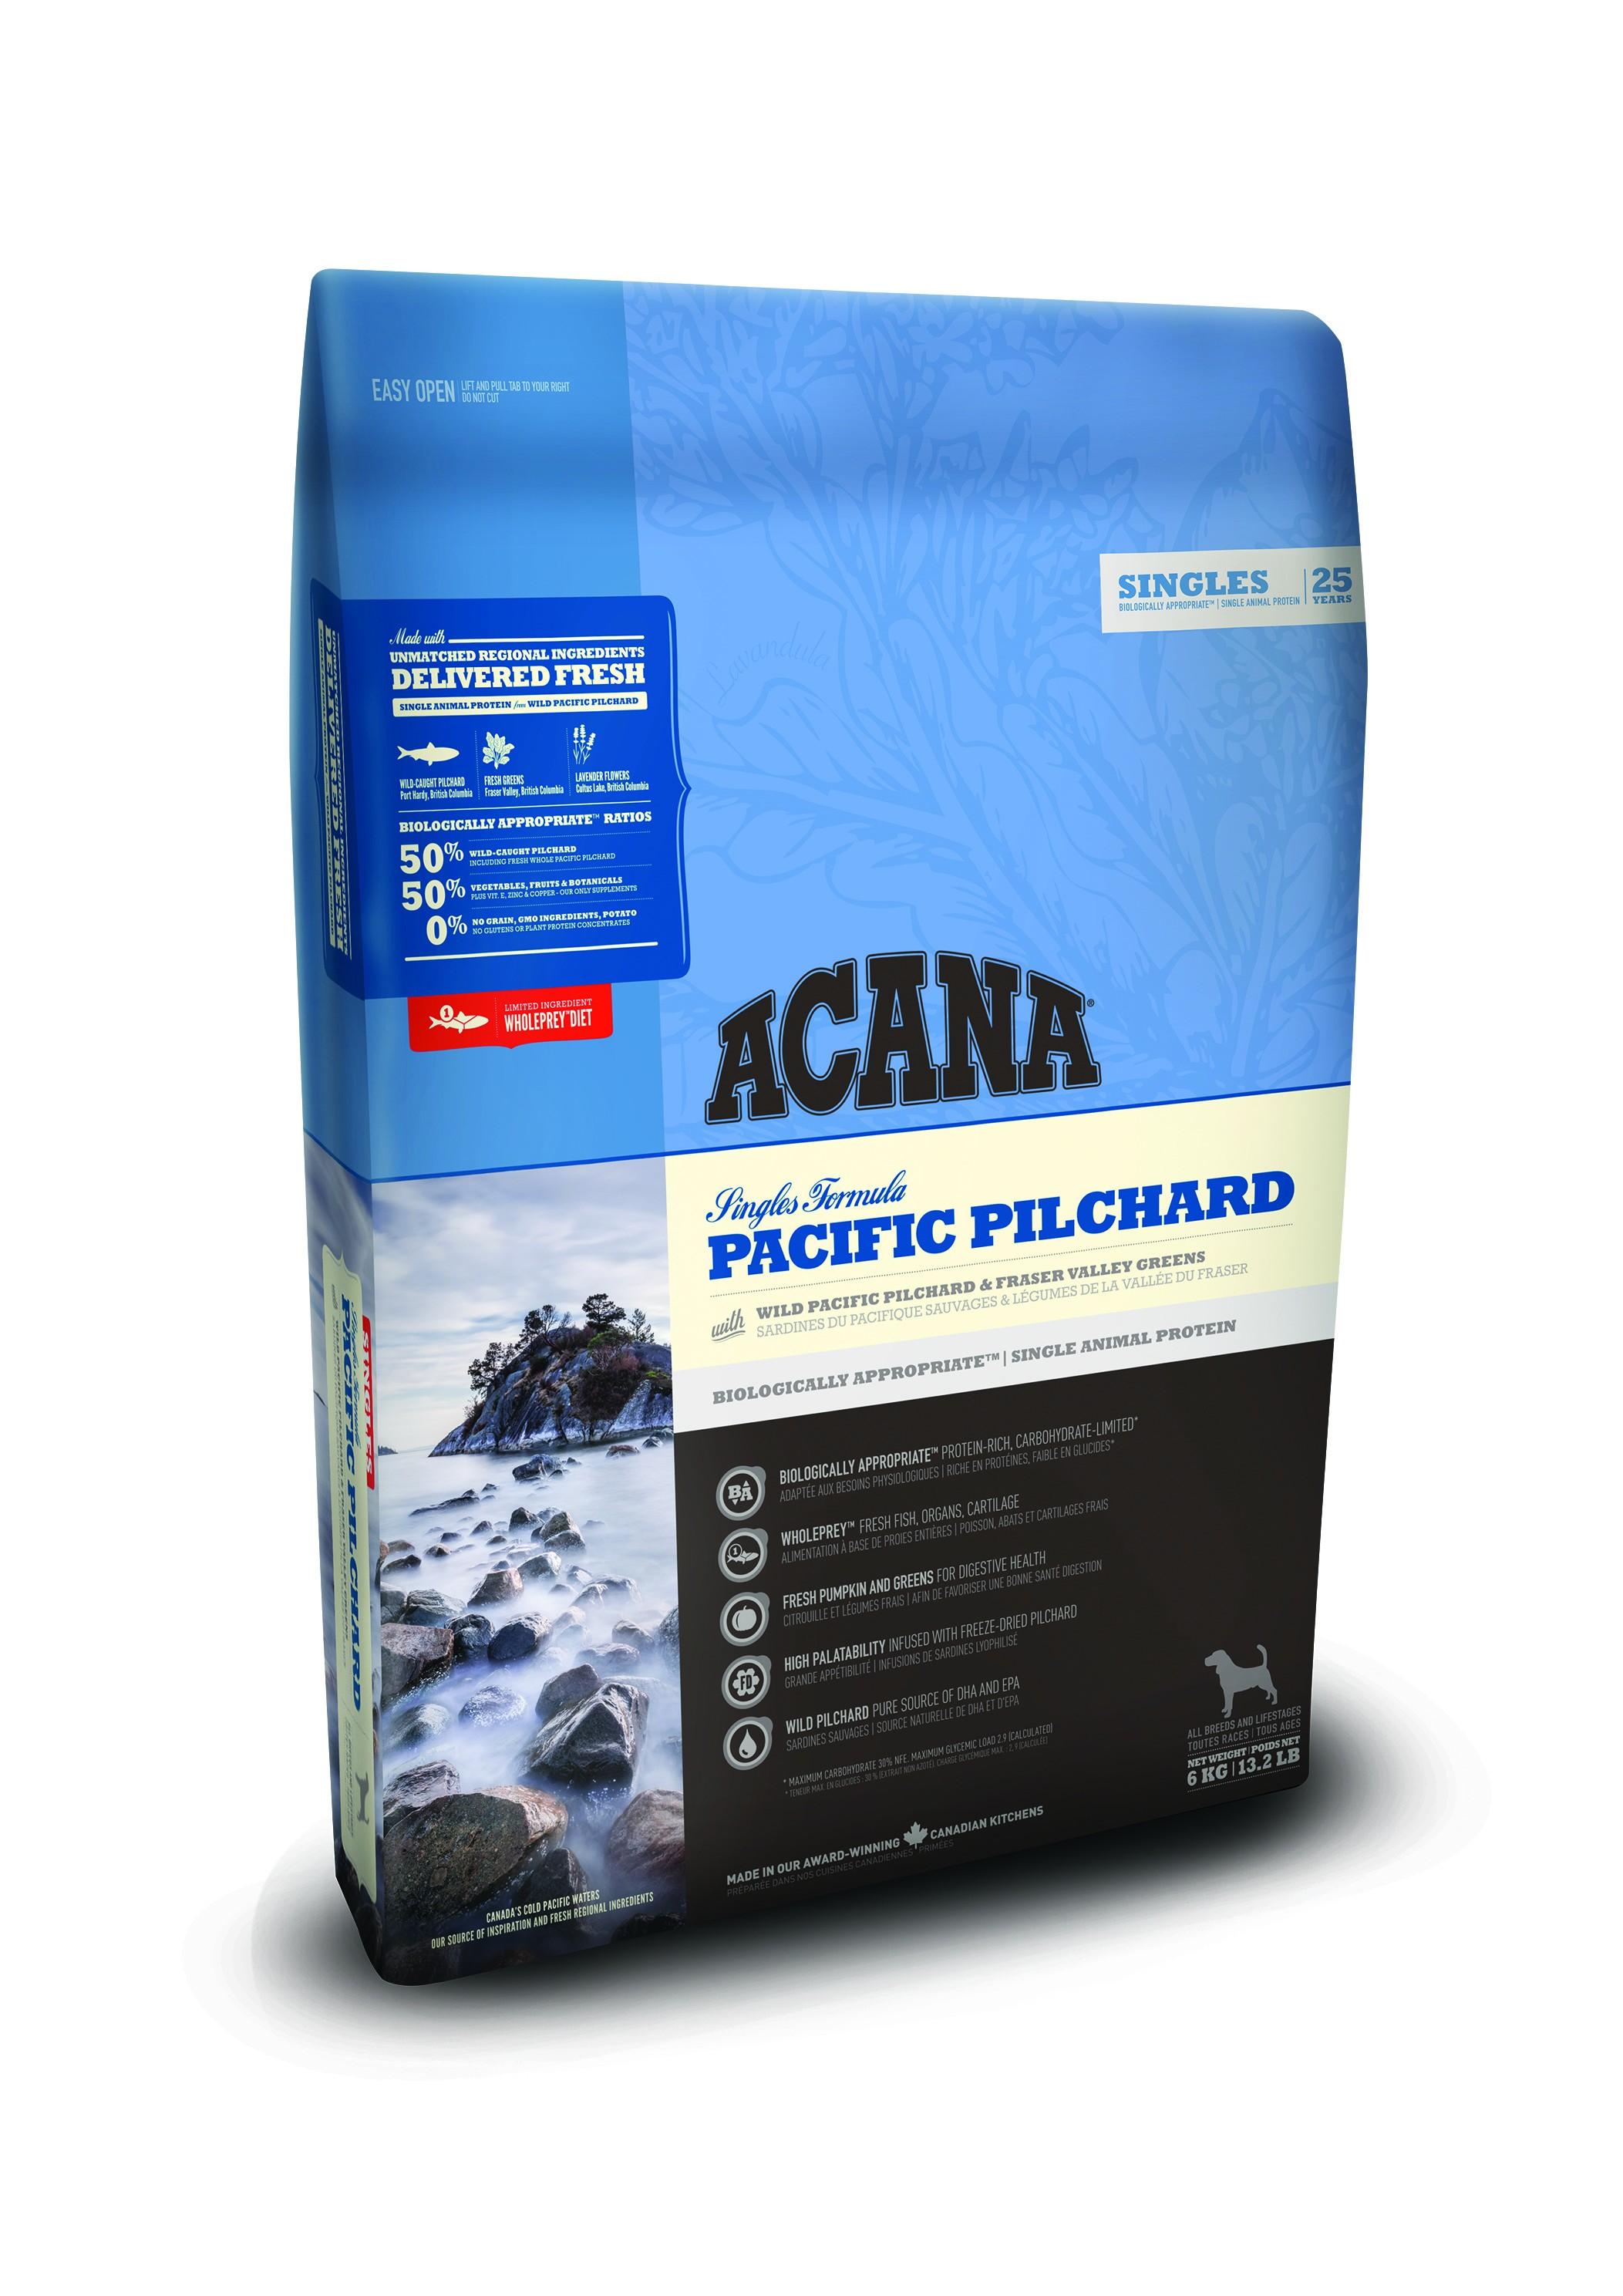 Acana Singles - Pacific Pilchard